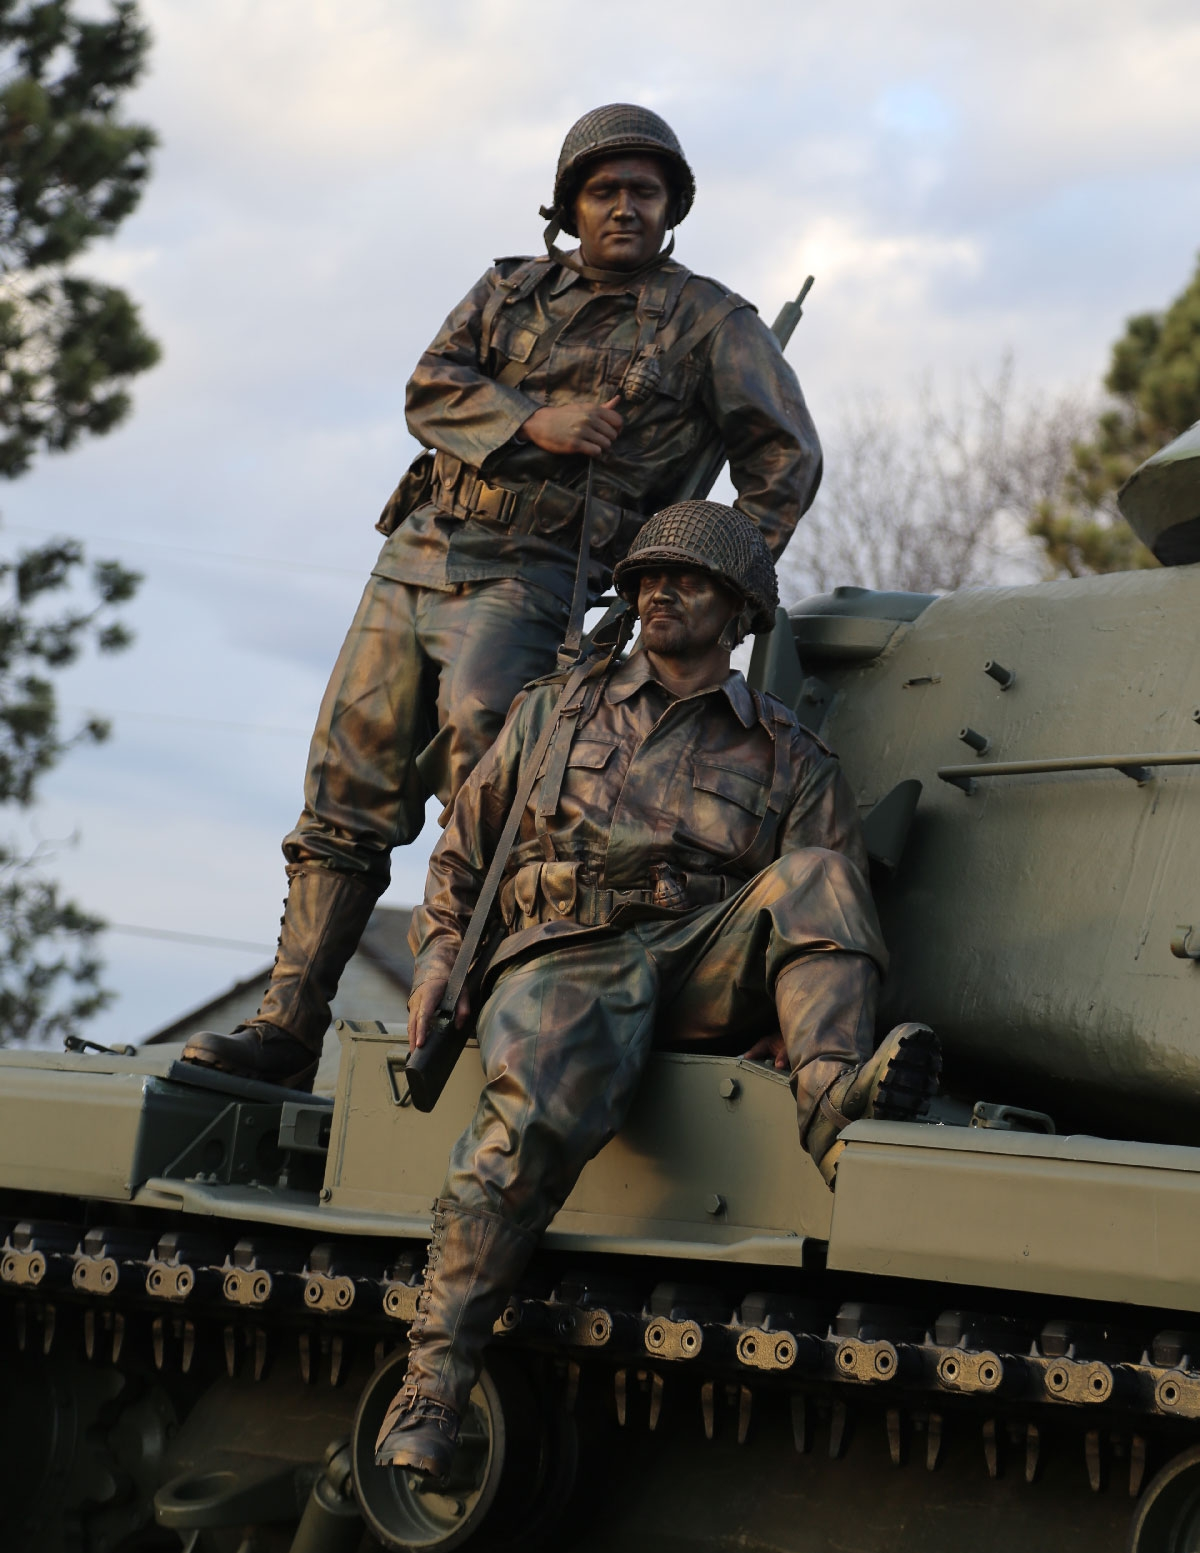 toy-soldiers-army-men.jpg